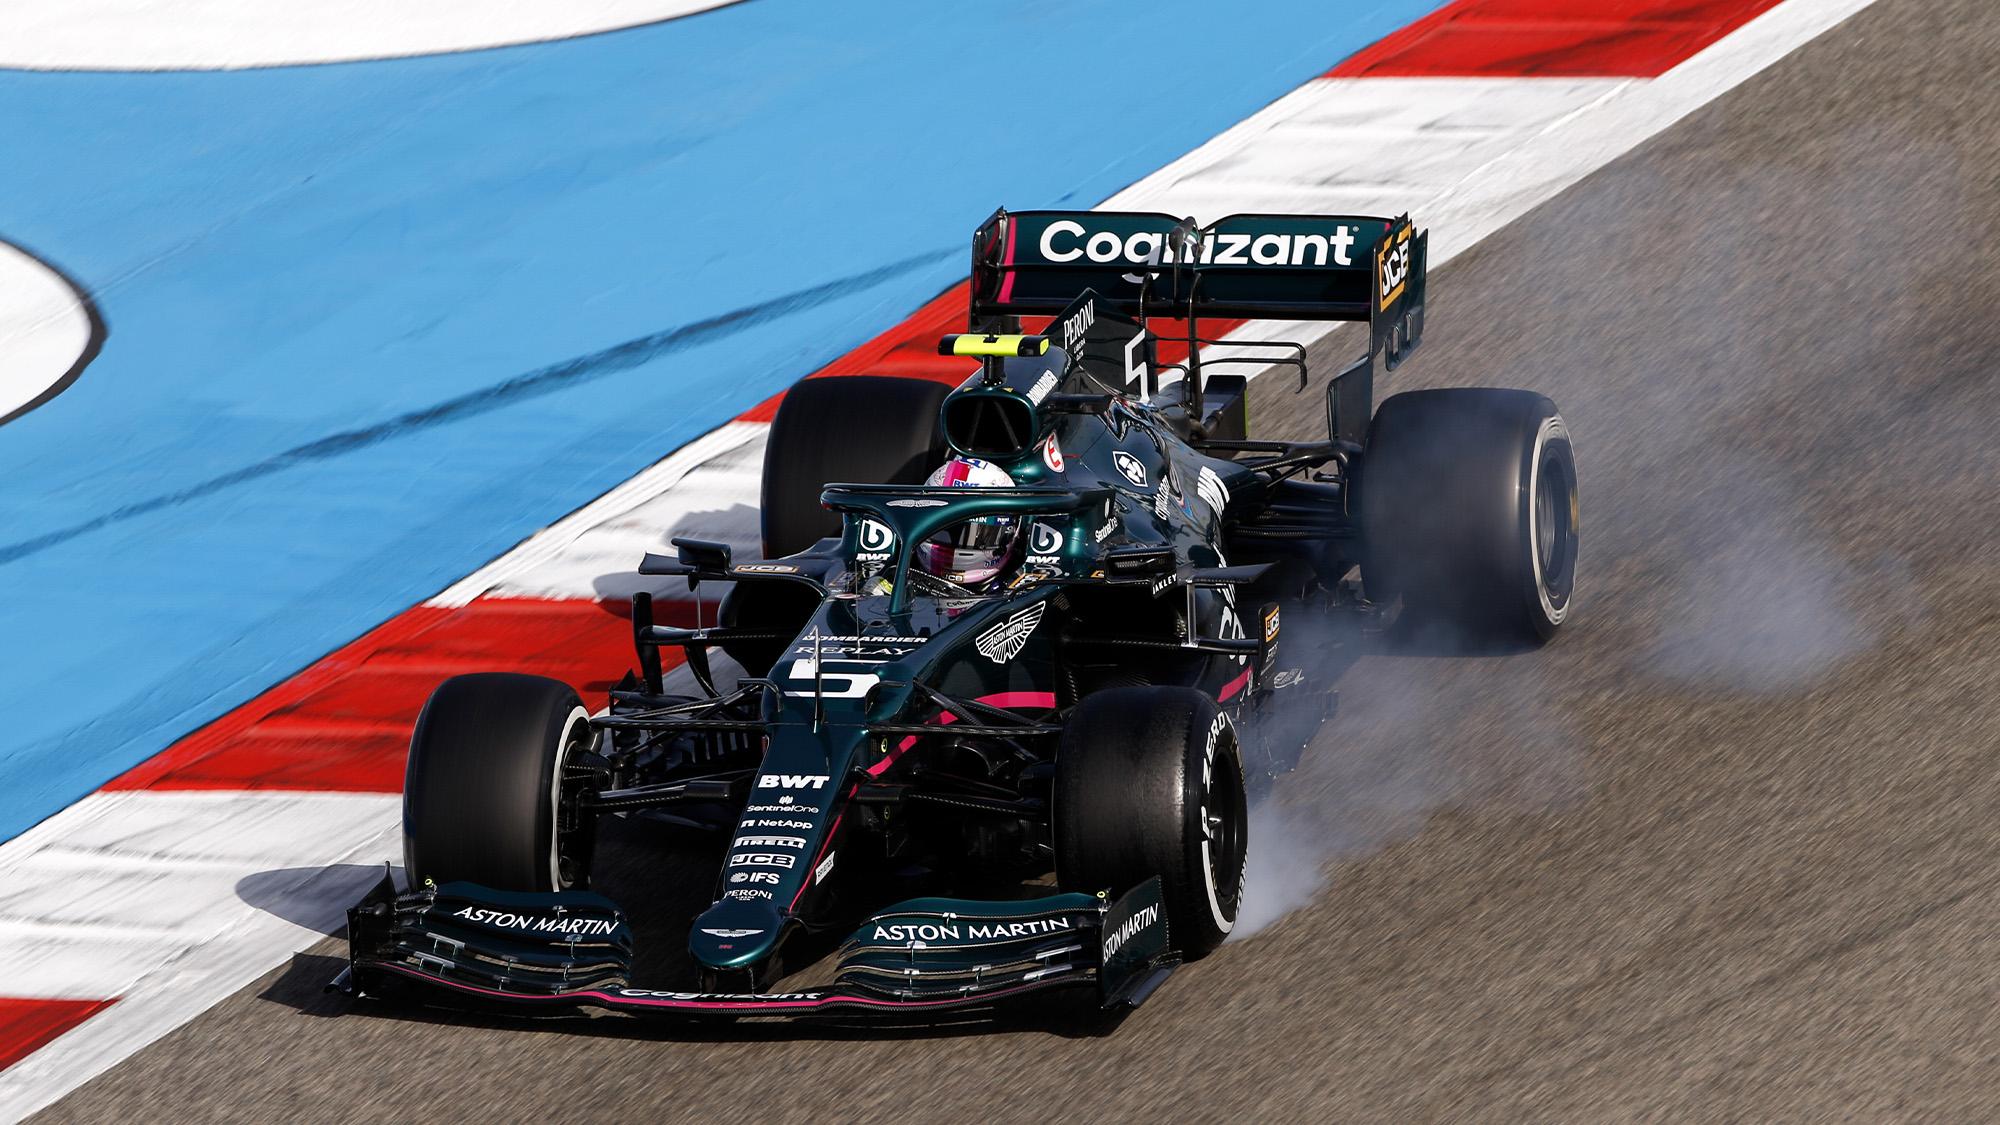 Sebastian Vettel locks up his tyres during the 2021 Bahrain Grand Prix